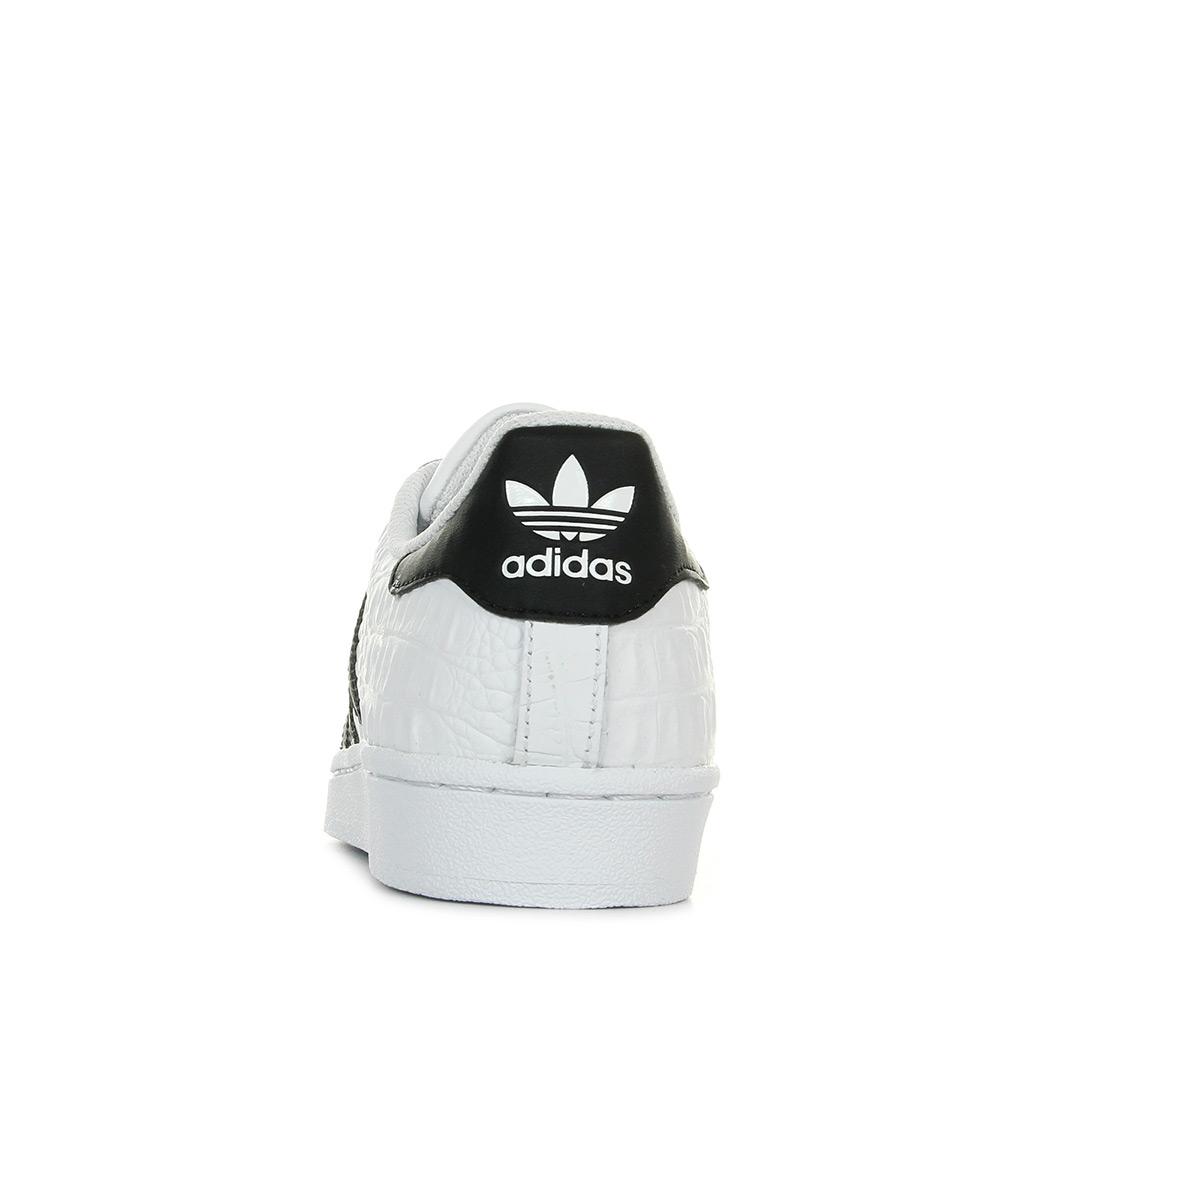 Adidas Bz0198Baskets Superstar Mode Bz0198Baskets Adidas Mode Femme Superstar Adidas Femme wN80nvm